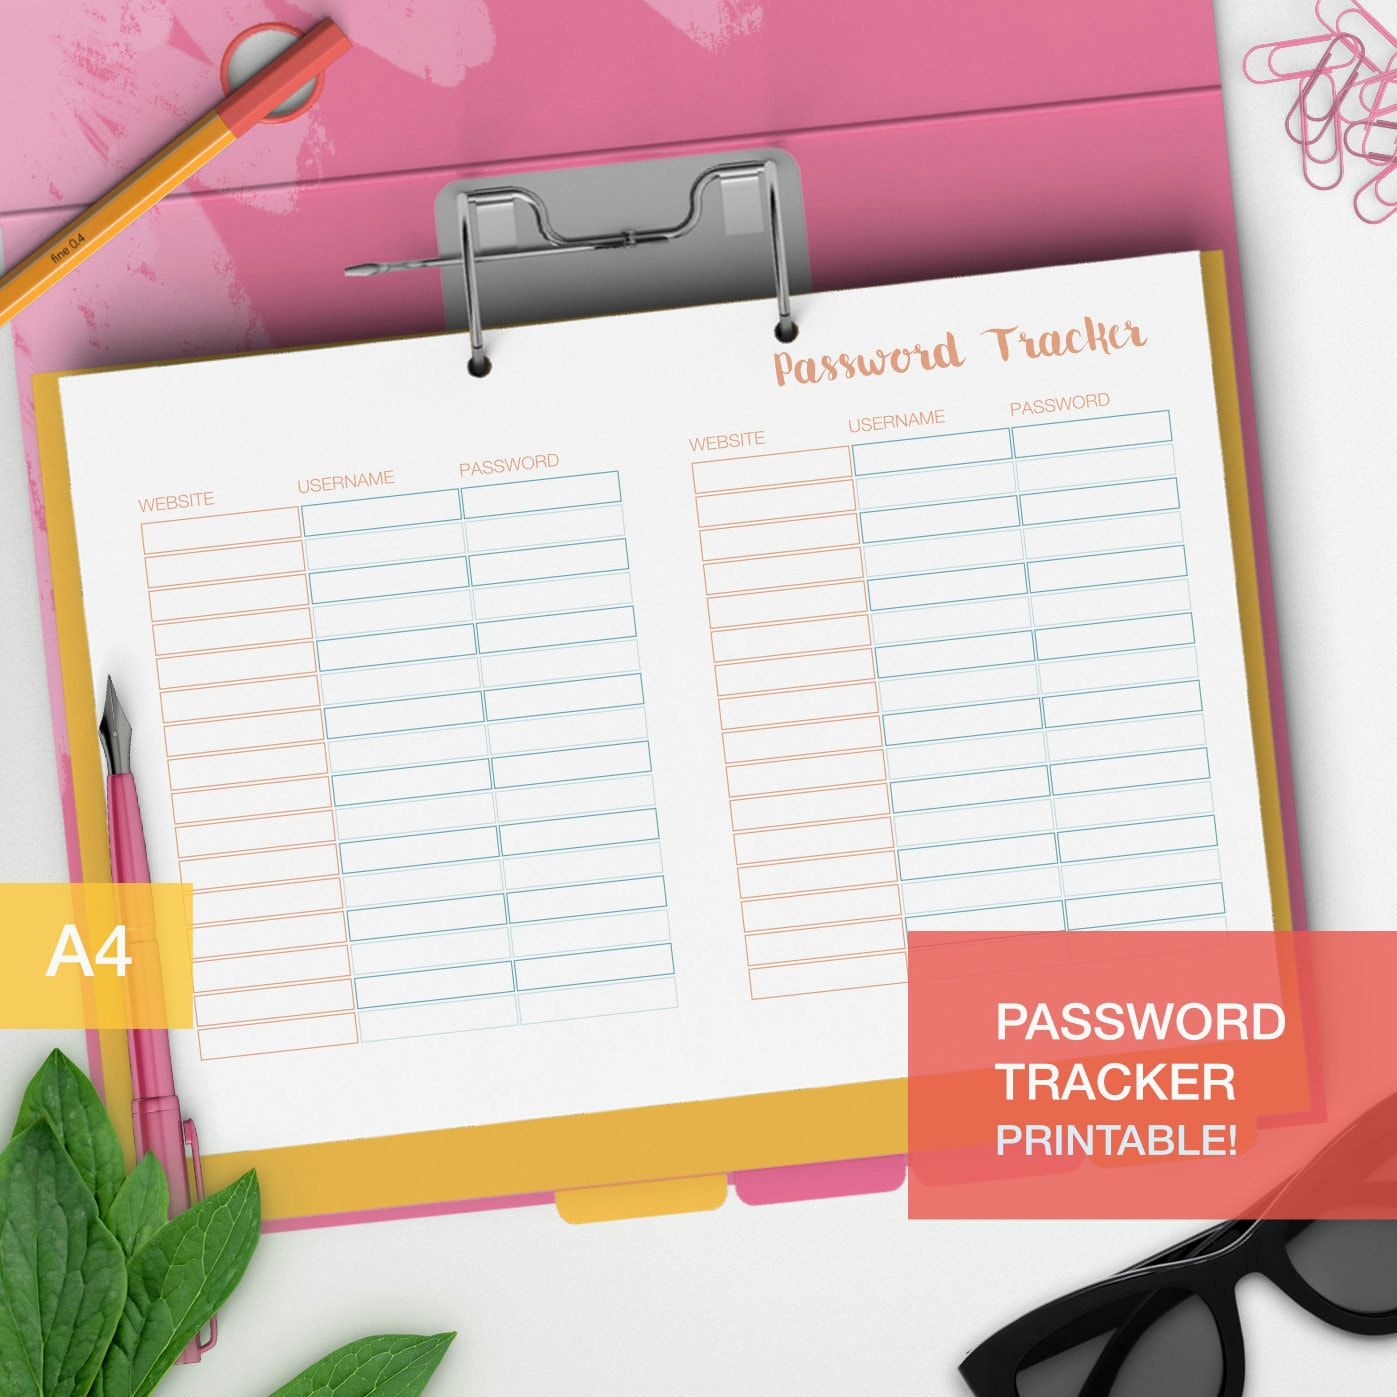 Password Tracker Organizer Printable A4 Planner Insert | Etsy